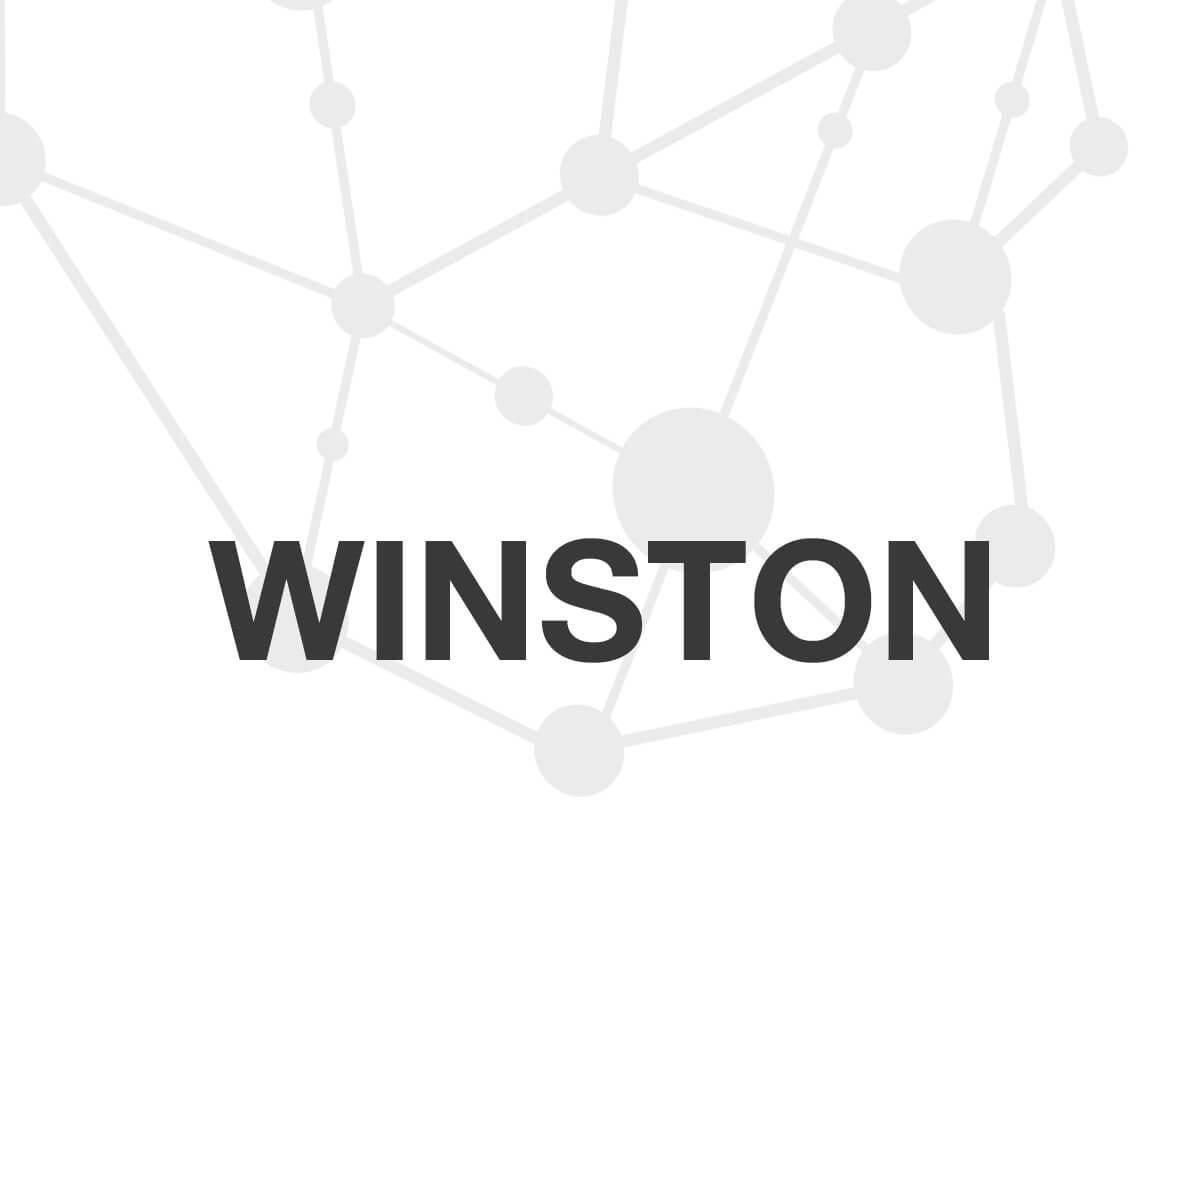 Node.js Winston